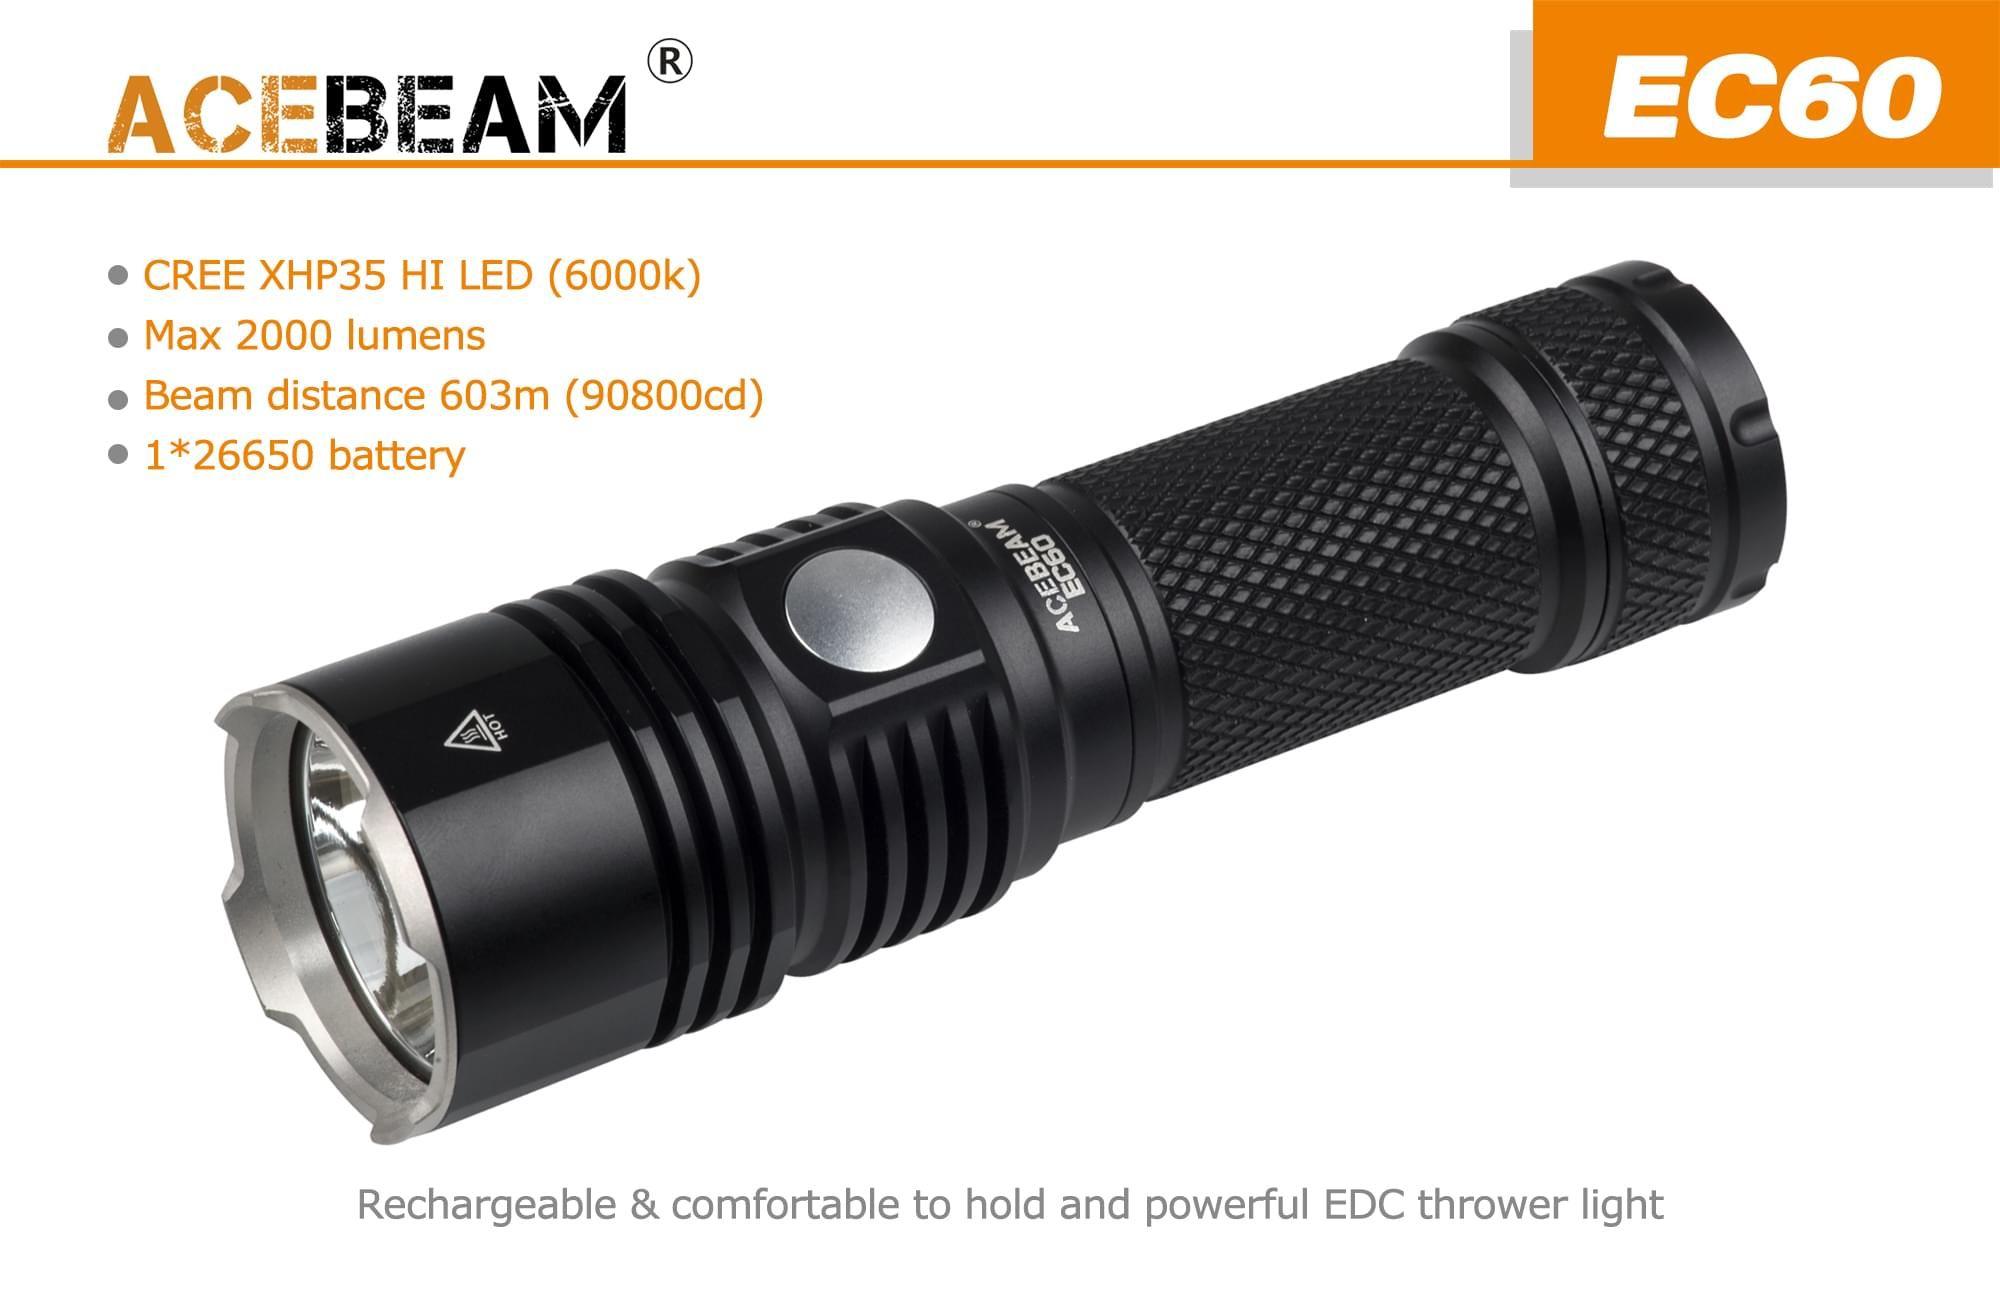 Battery ACEBEAM EC60 Cree XHP35 HI LED USB Rechargeable EDC Flashlight Torch